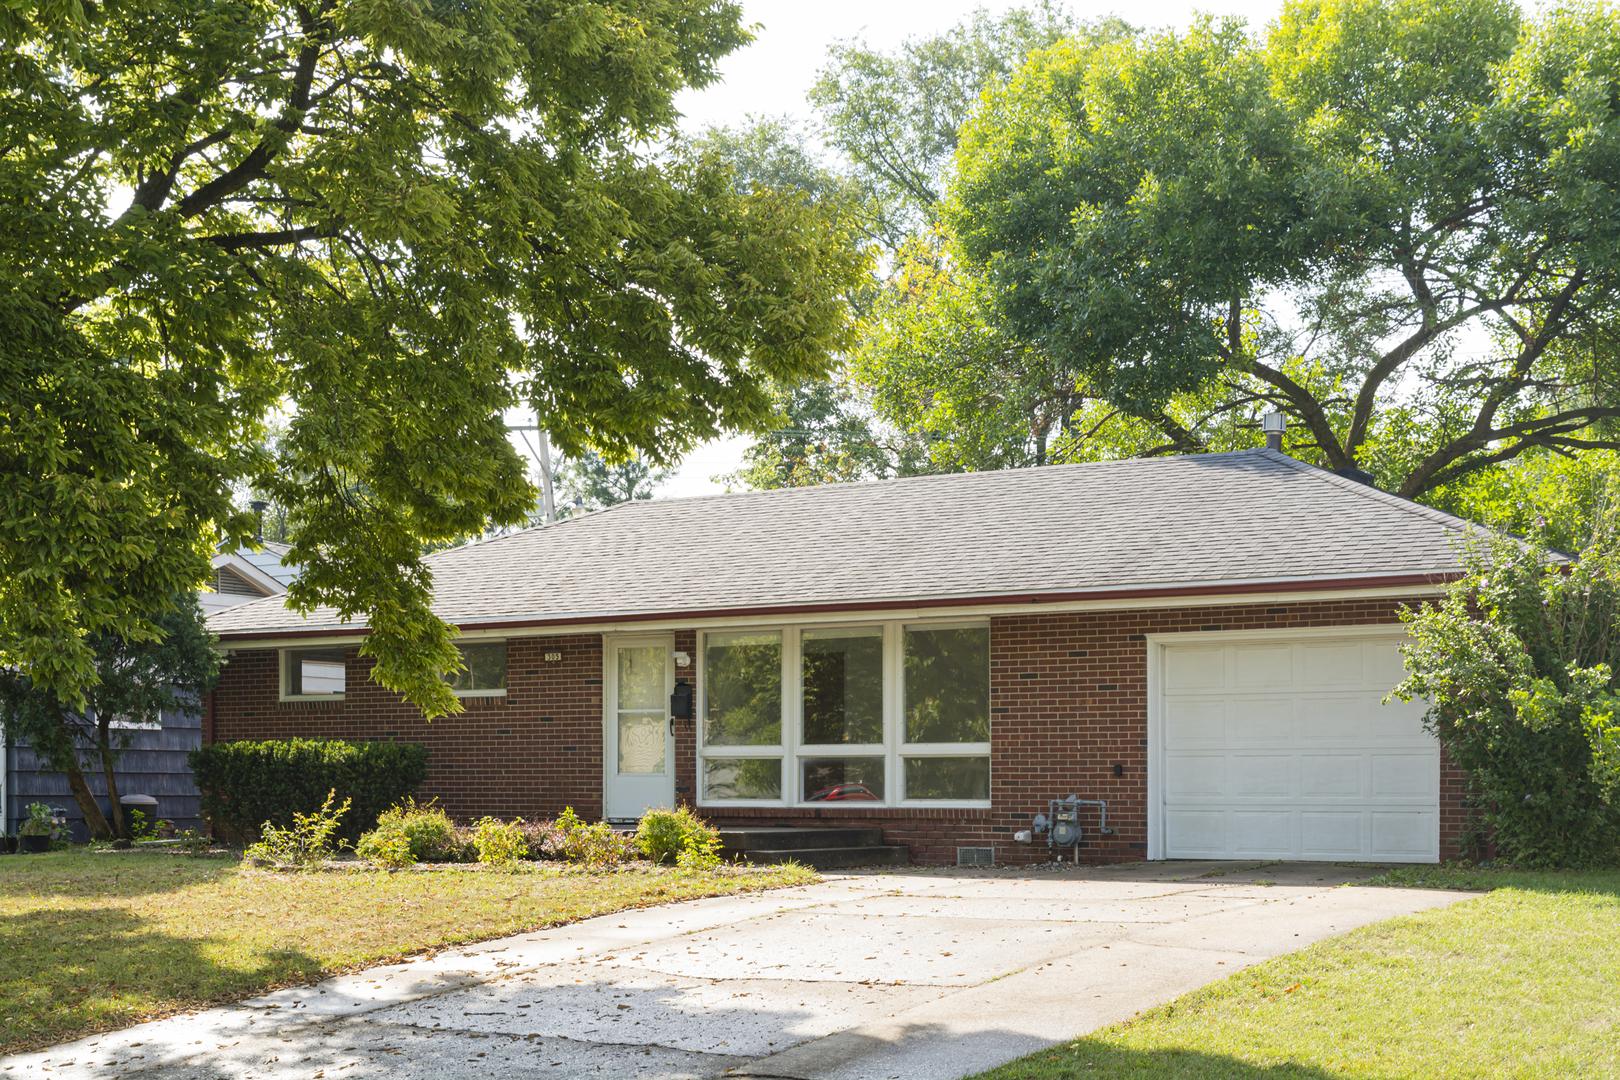 305 Edgebrook, Champaign, Illinois, 61820